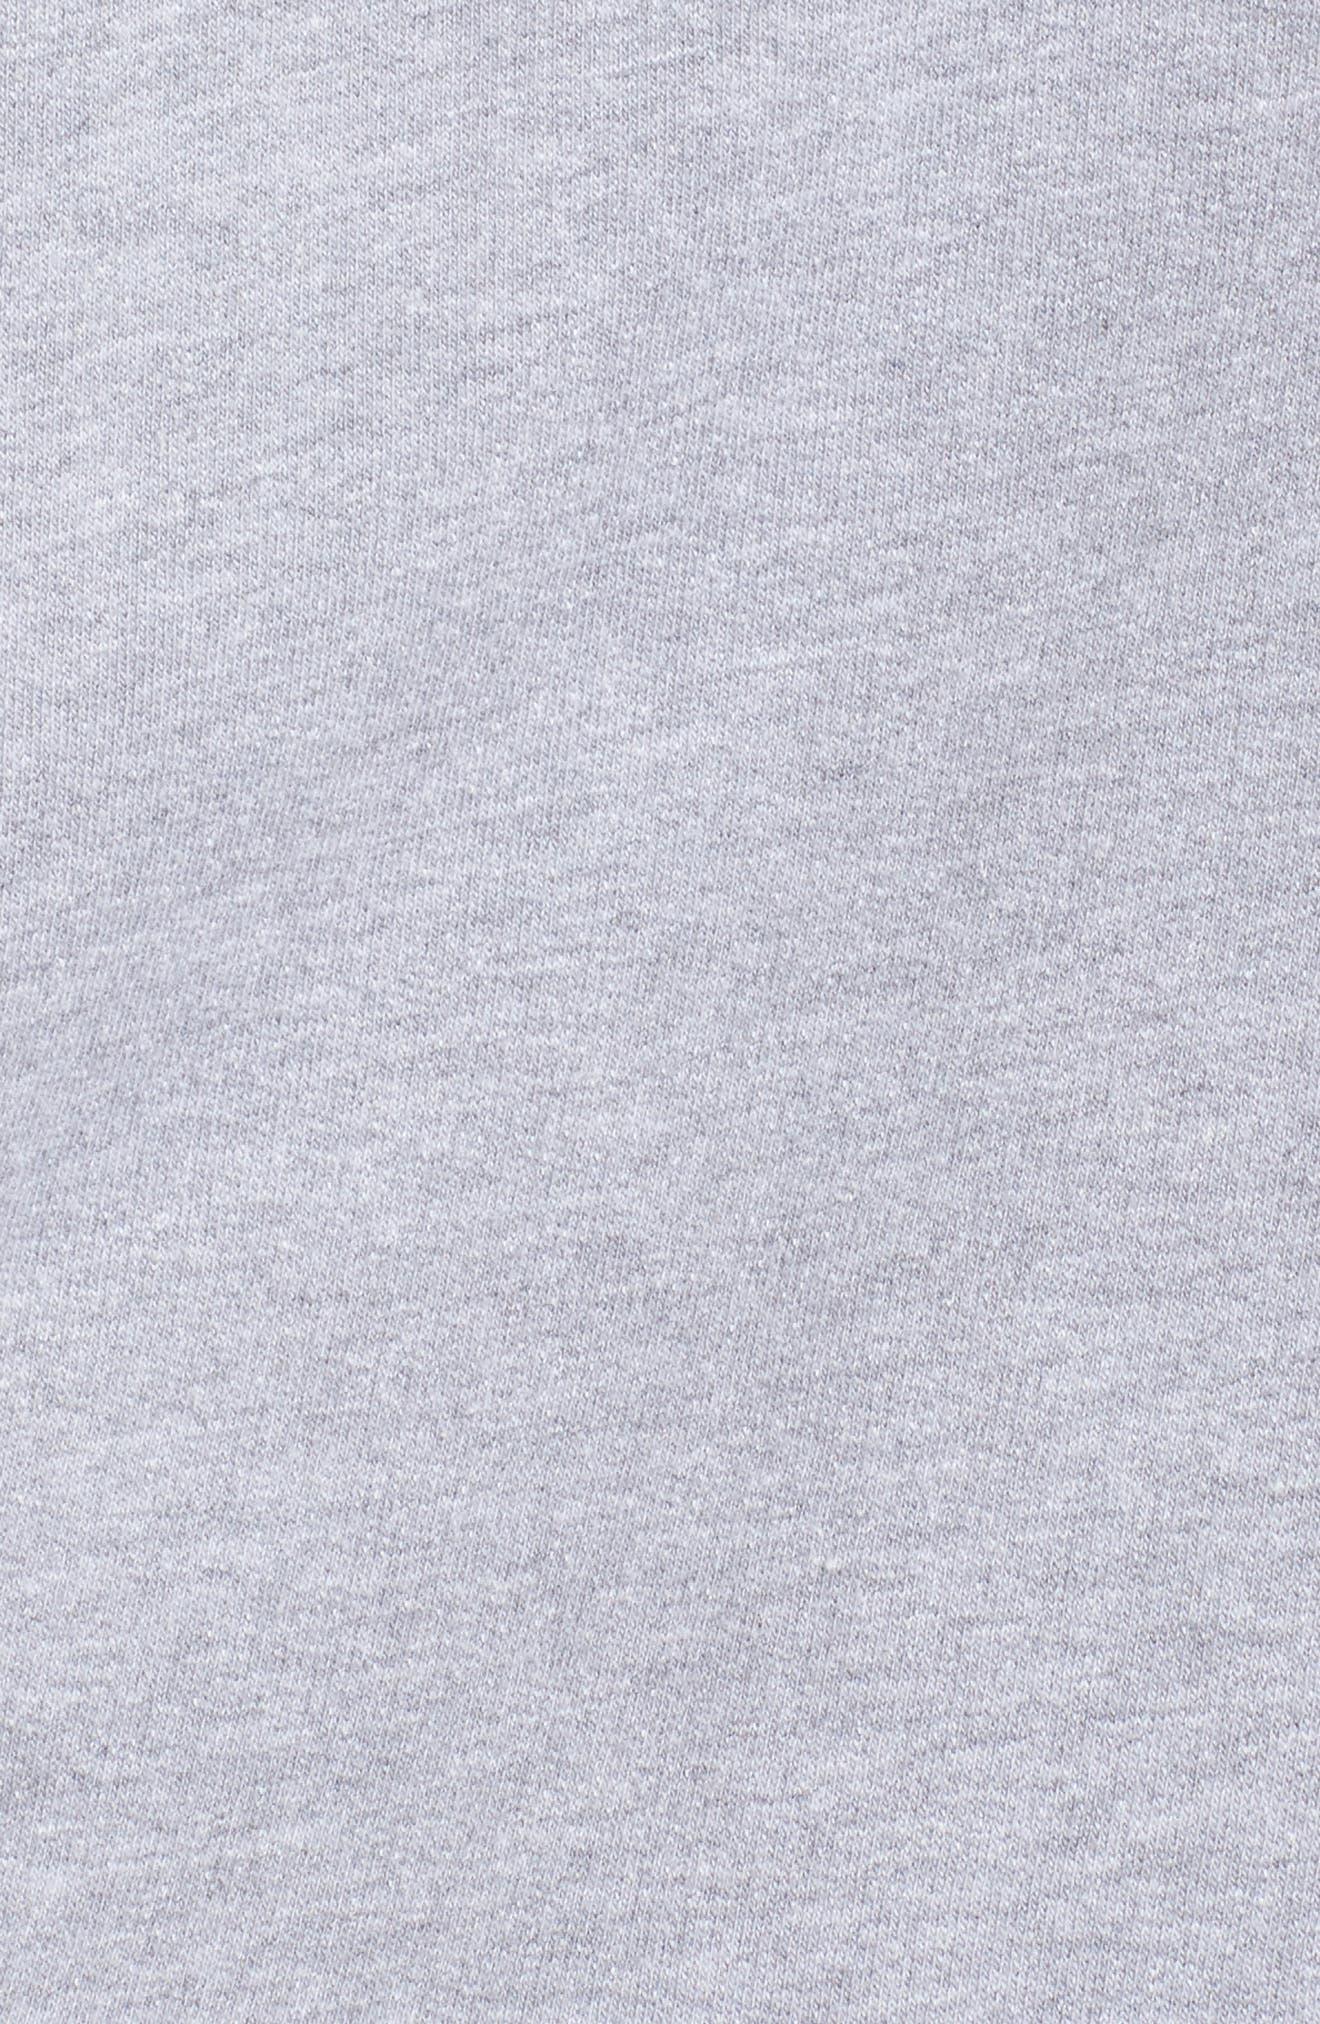 Ellstan Oversize Boyfriend Sweatshirt,                             Alternate thumbnail 5, color,                             035